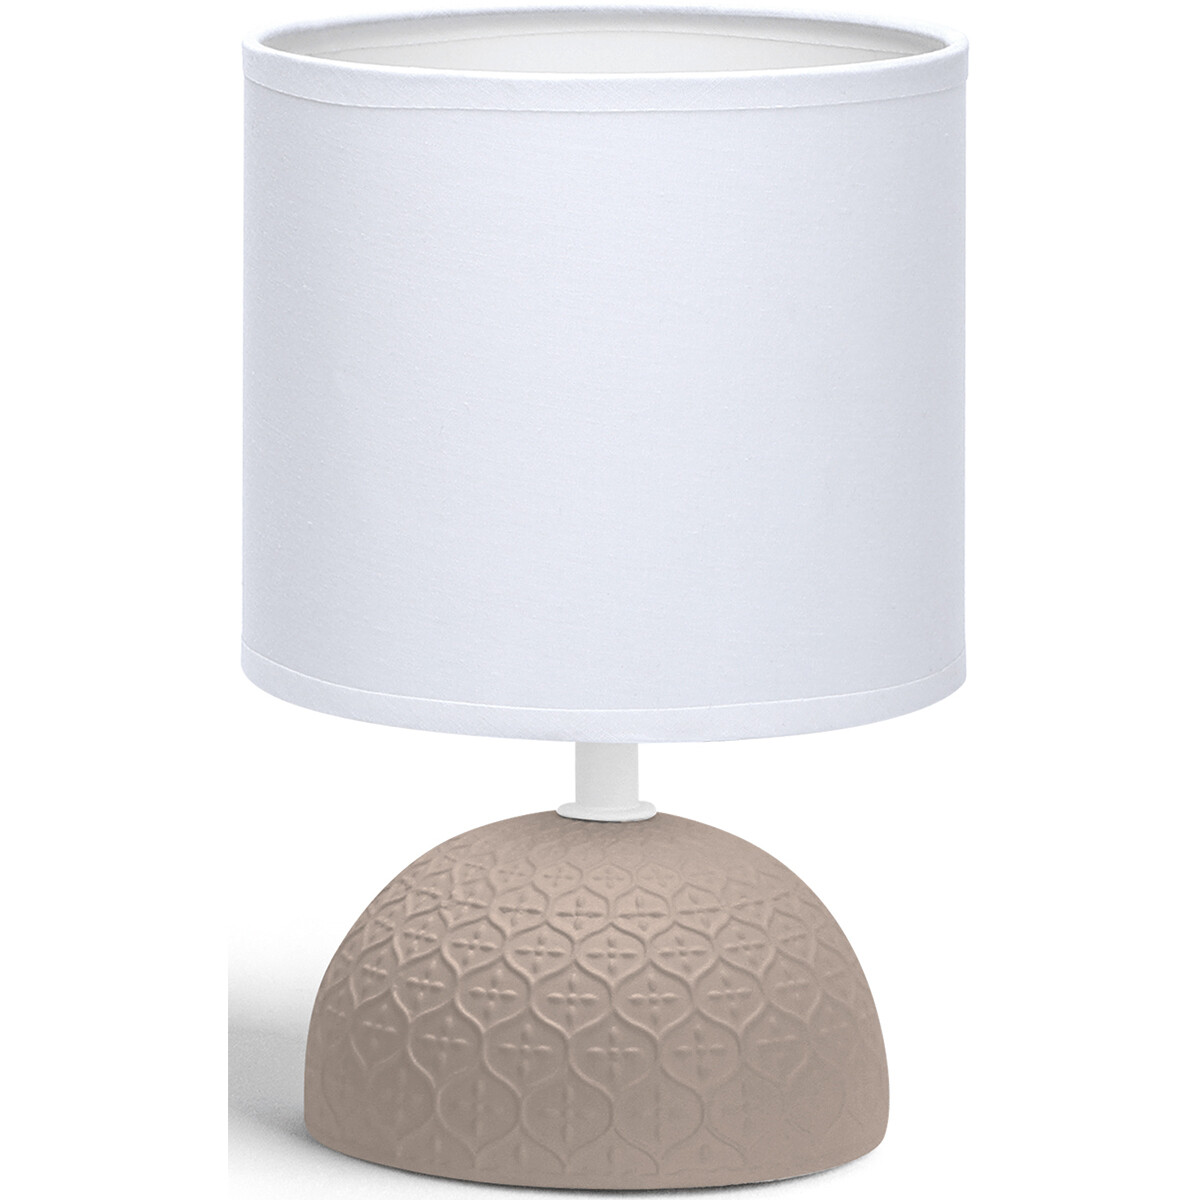 LED Tafellamp - Tafelverlichting - Aigi Conton 1 - E14 Fitting - Rond - Mat Bruin - Keramiek